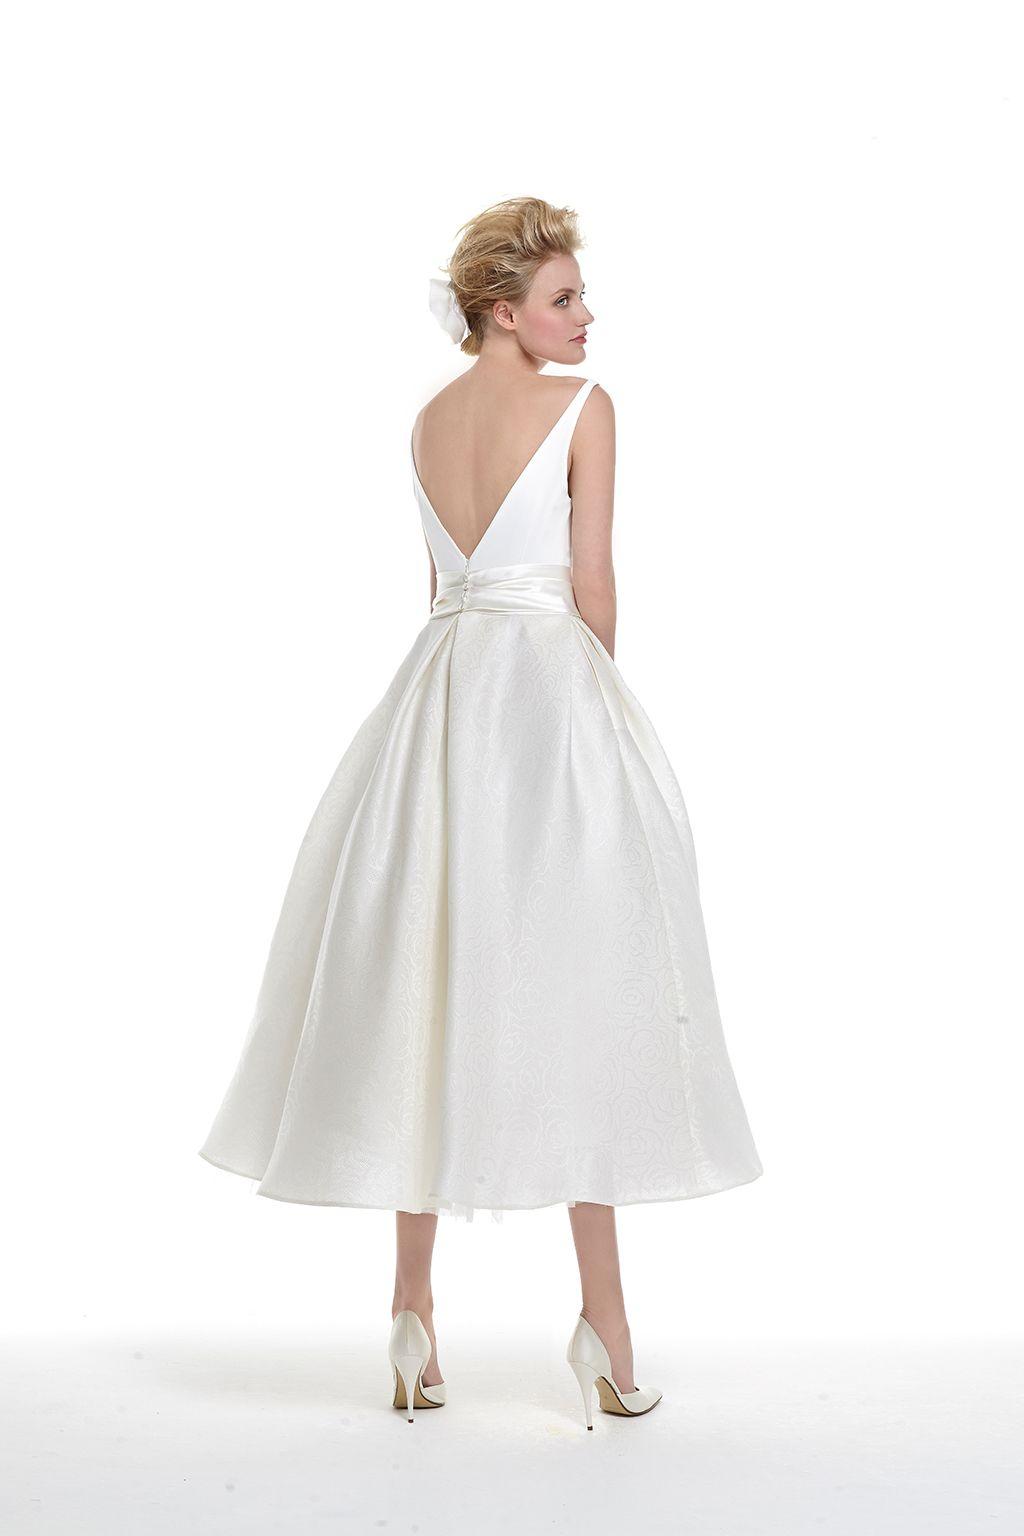 #didier #didieratelier #didiersalon #didiervencanice #vencanicedidier #venanice #bride #wedding #weddingdress #vencanje #unikatnevencanice #bridal #bridalfashion #tosca #capri